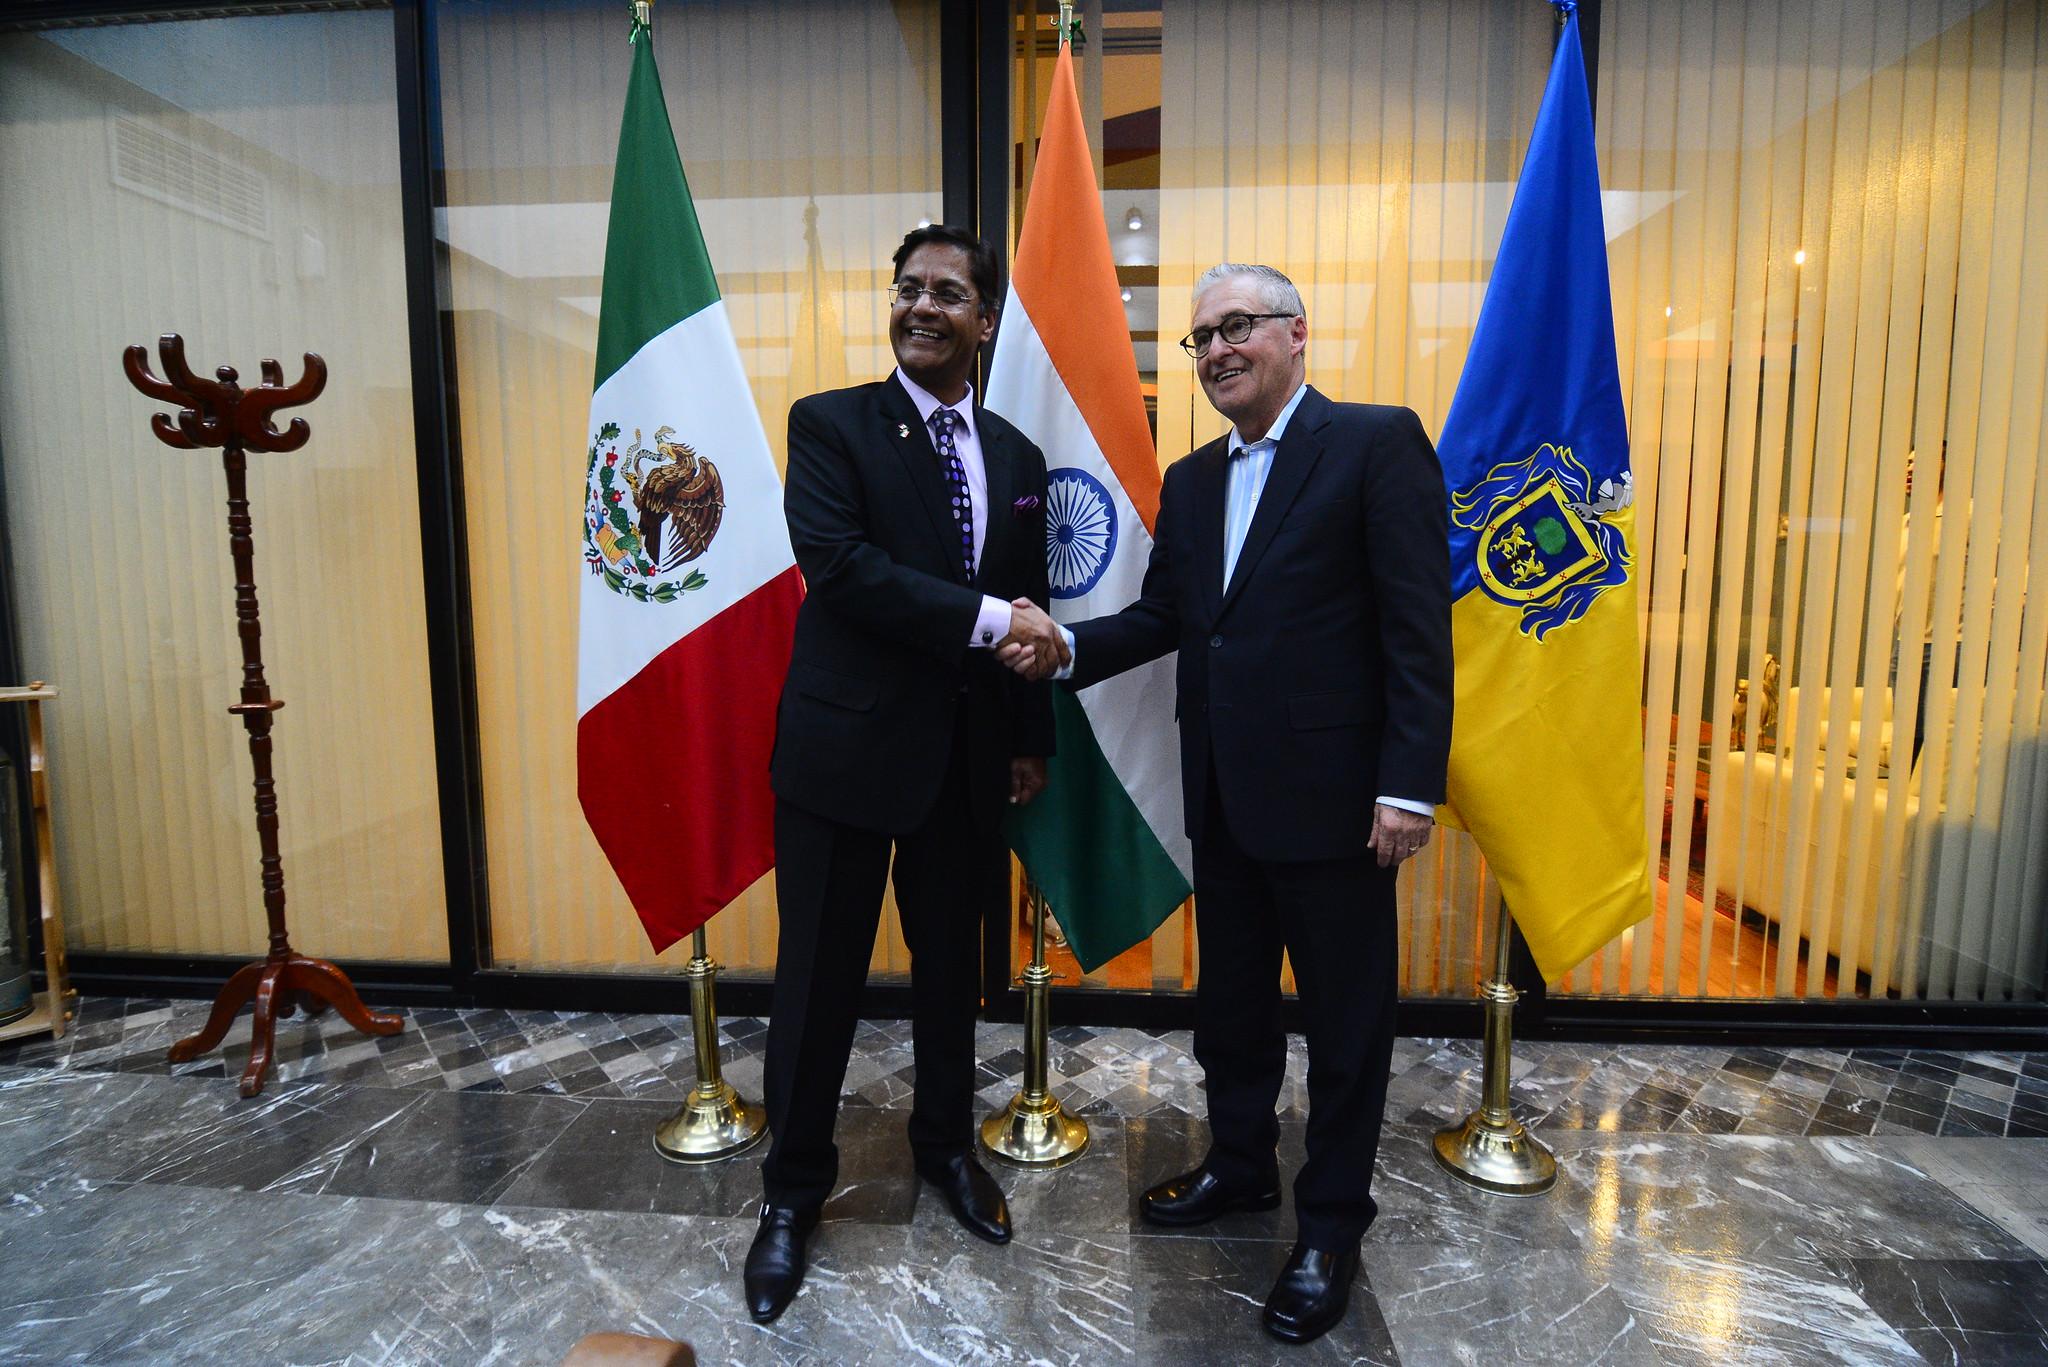 Reciben en Jalisco al Embajador de la India en México